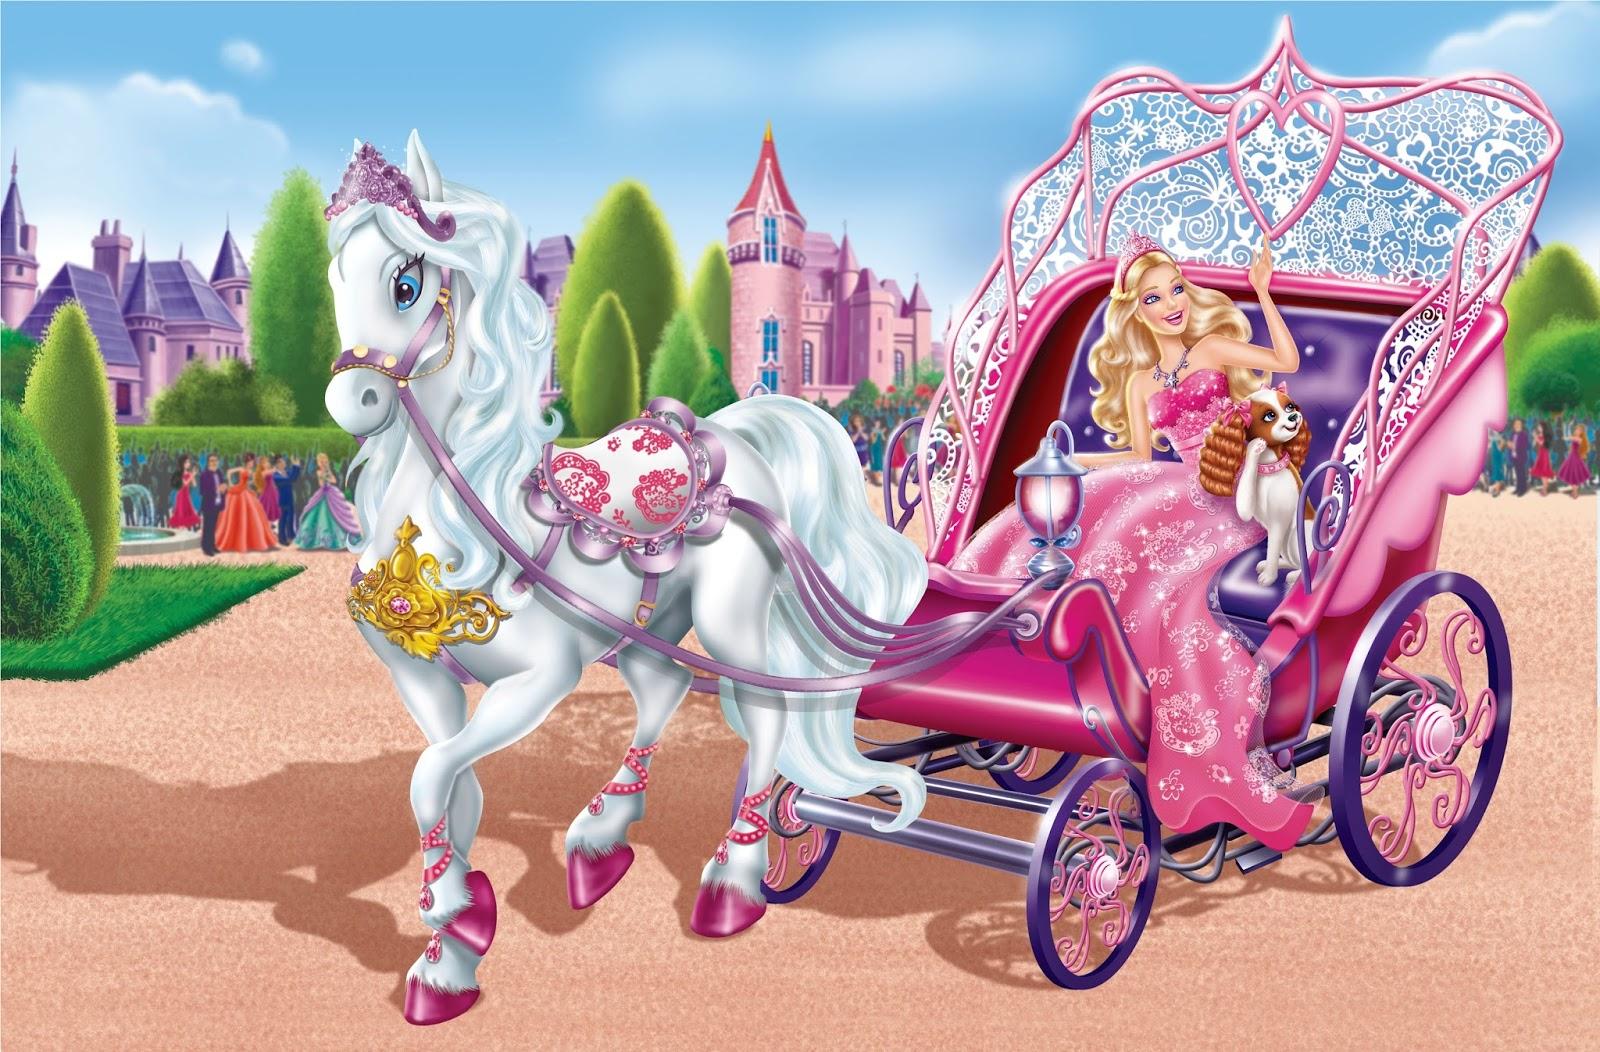 Popstar Barbie